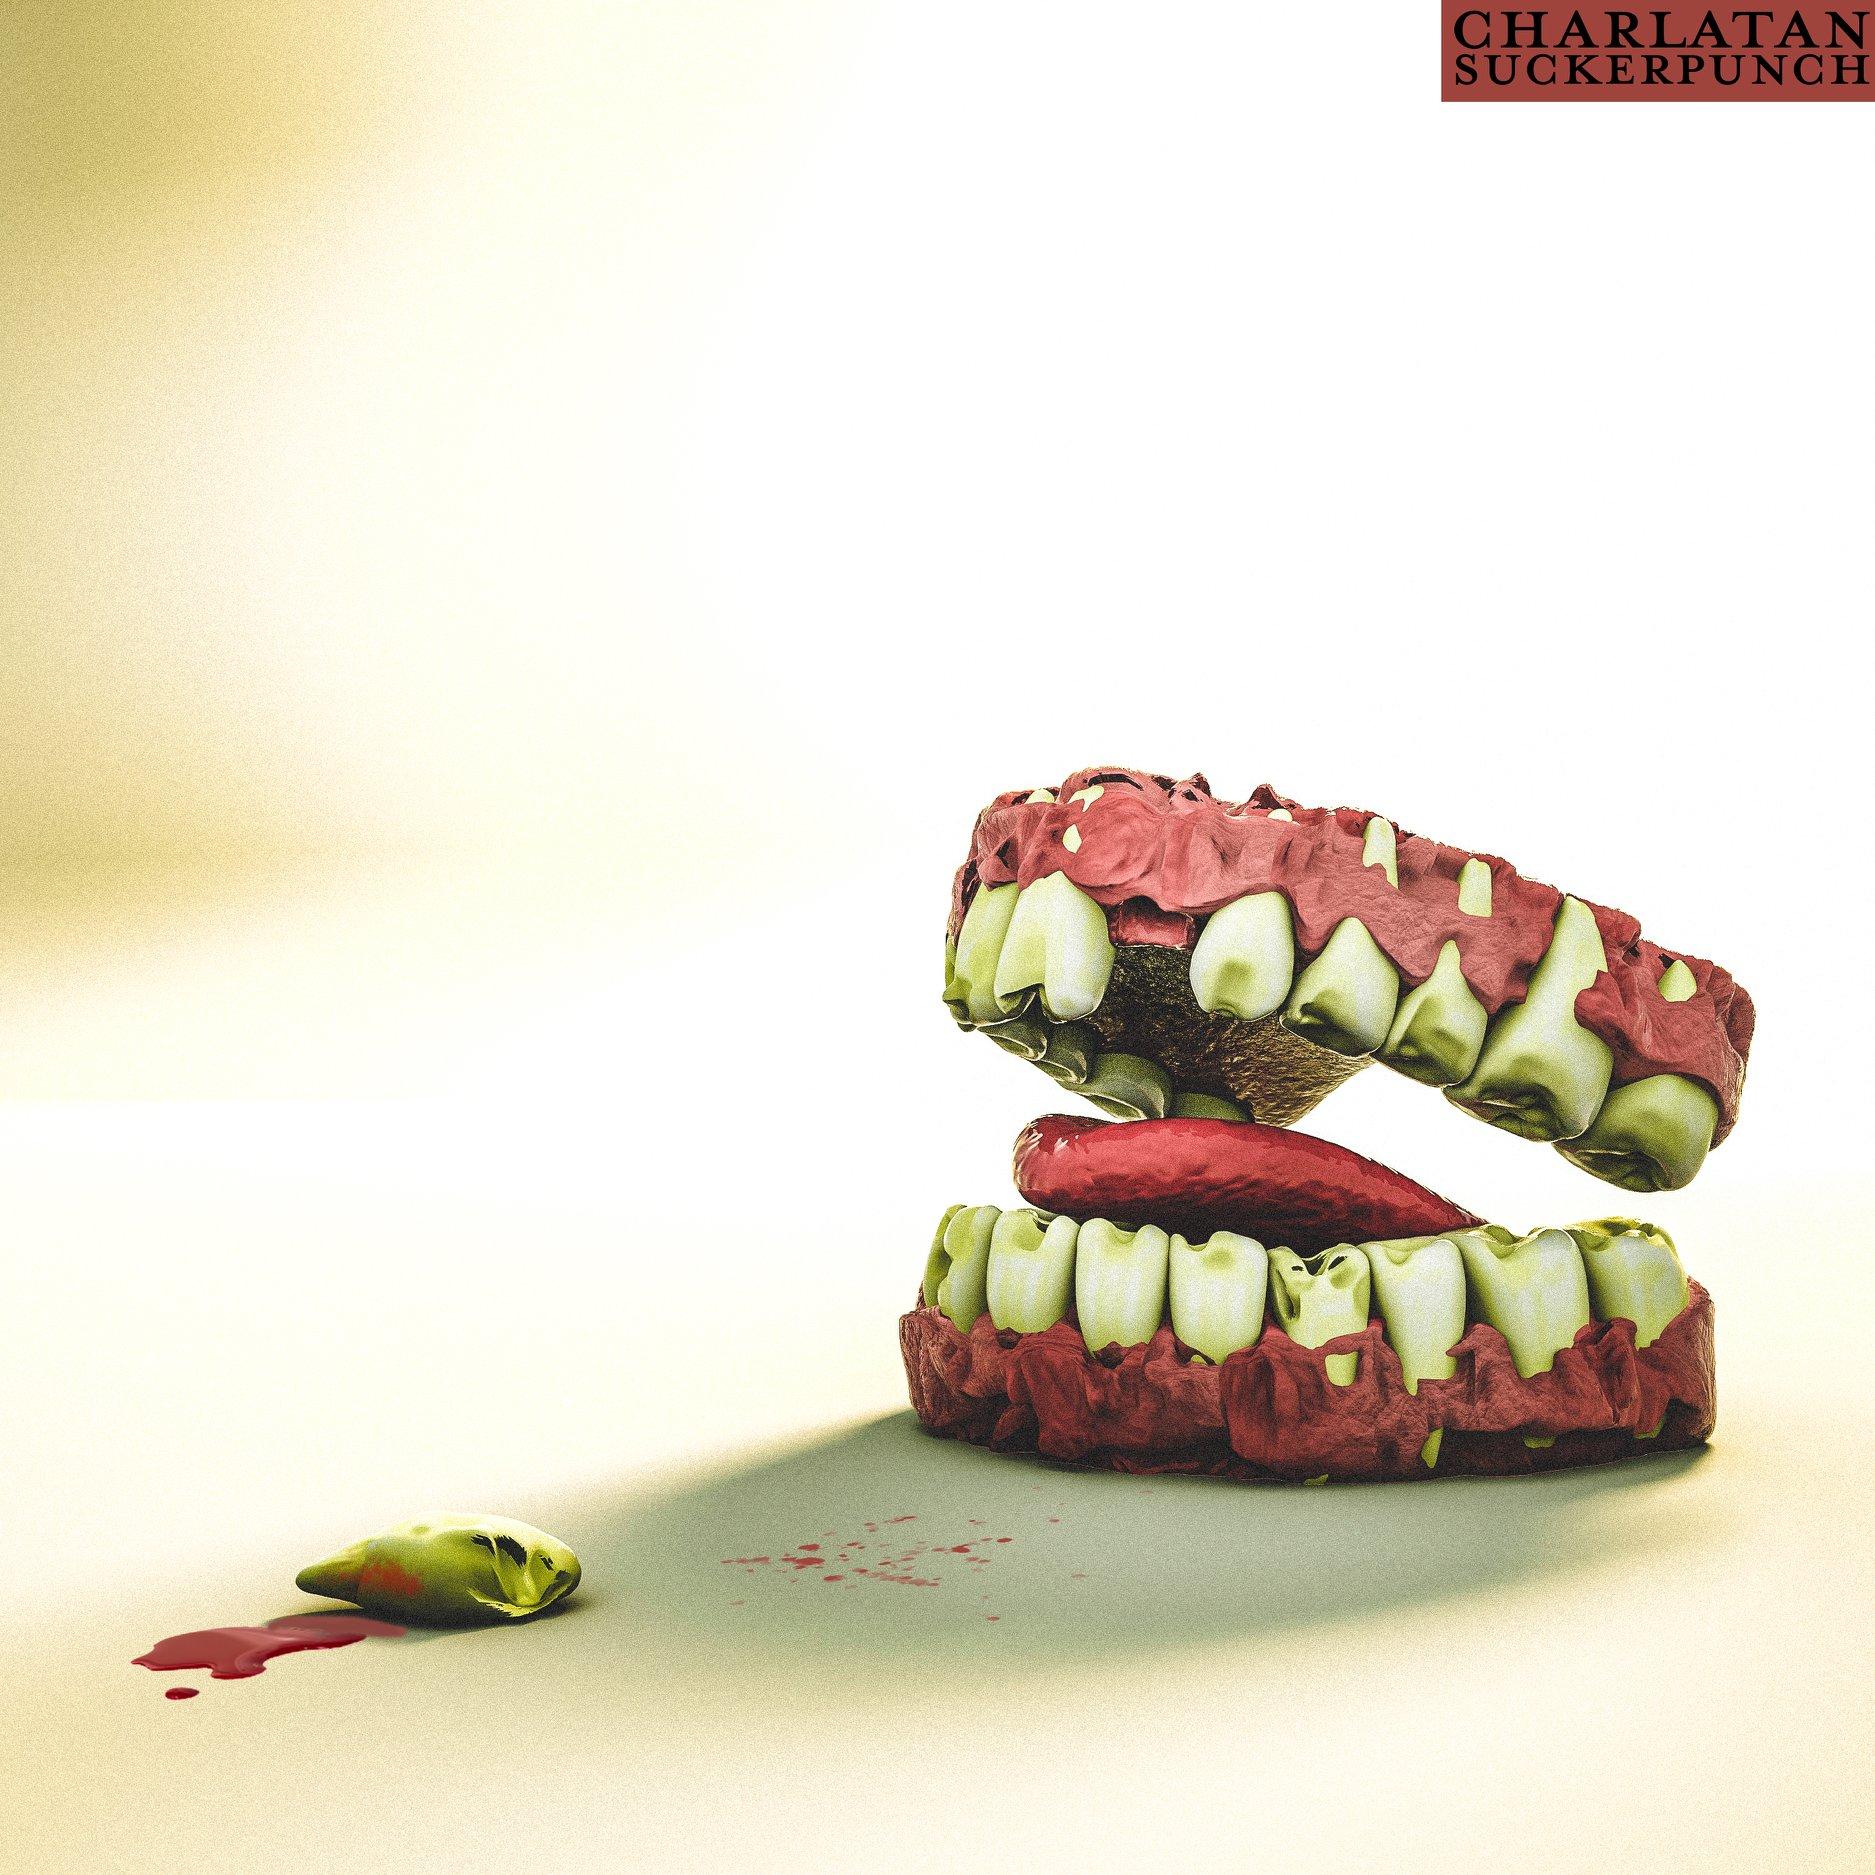 Charlatan - Sucker Punch single link.